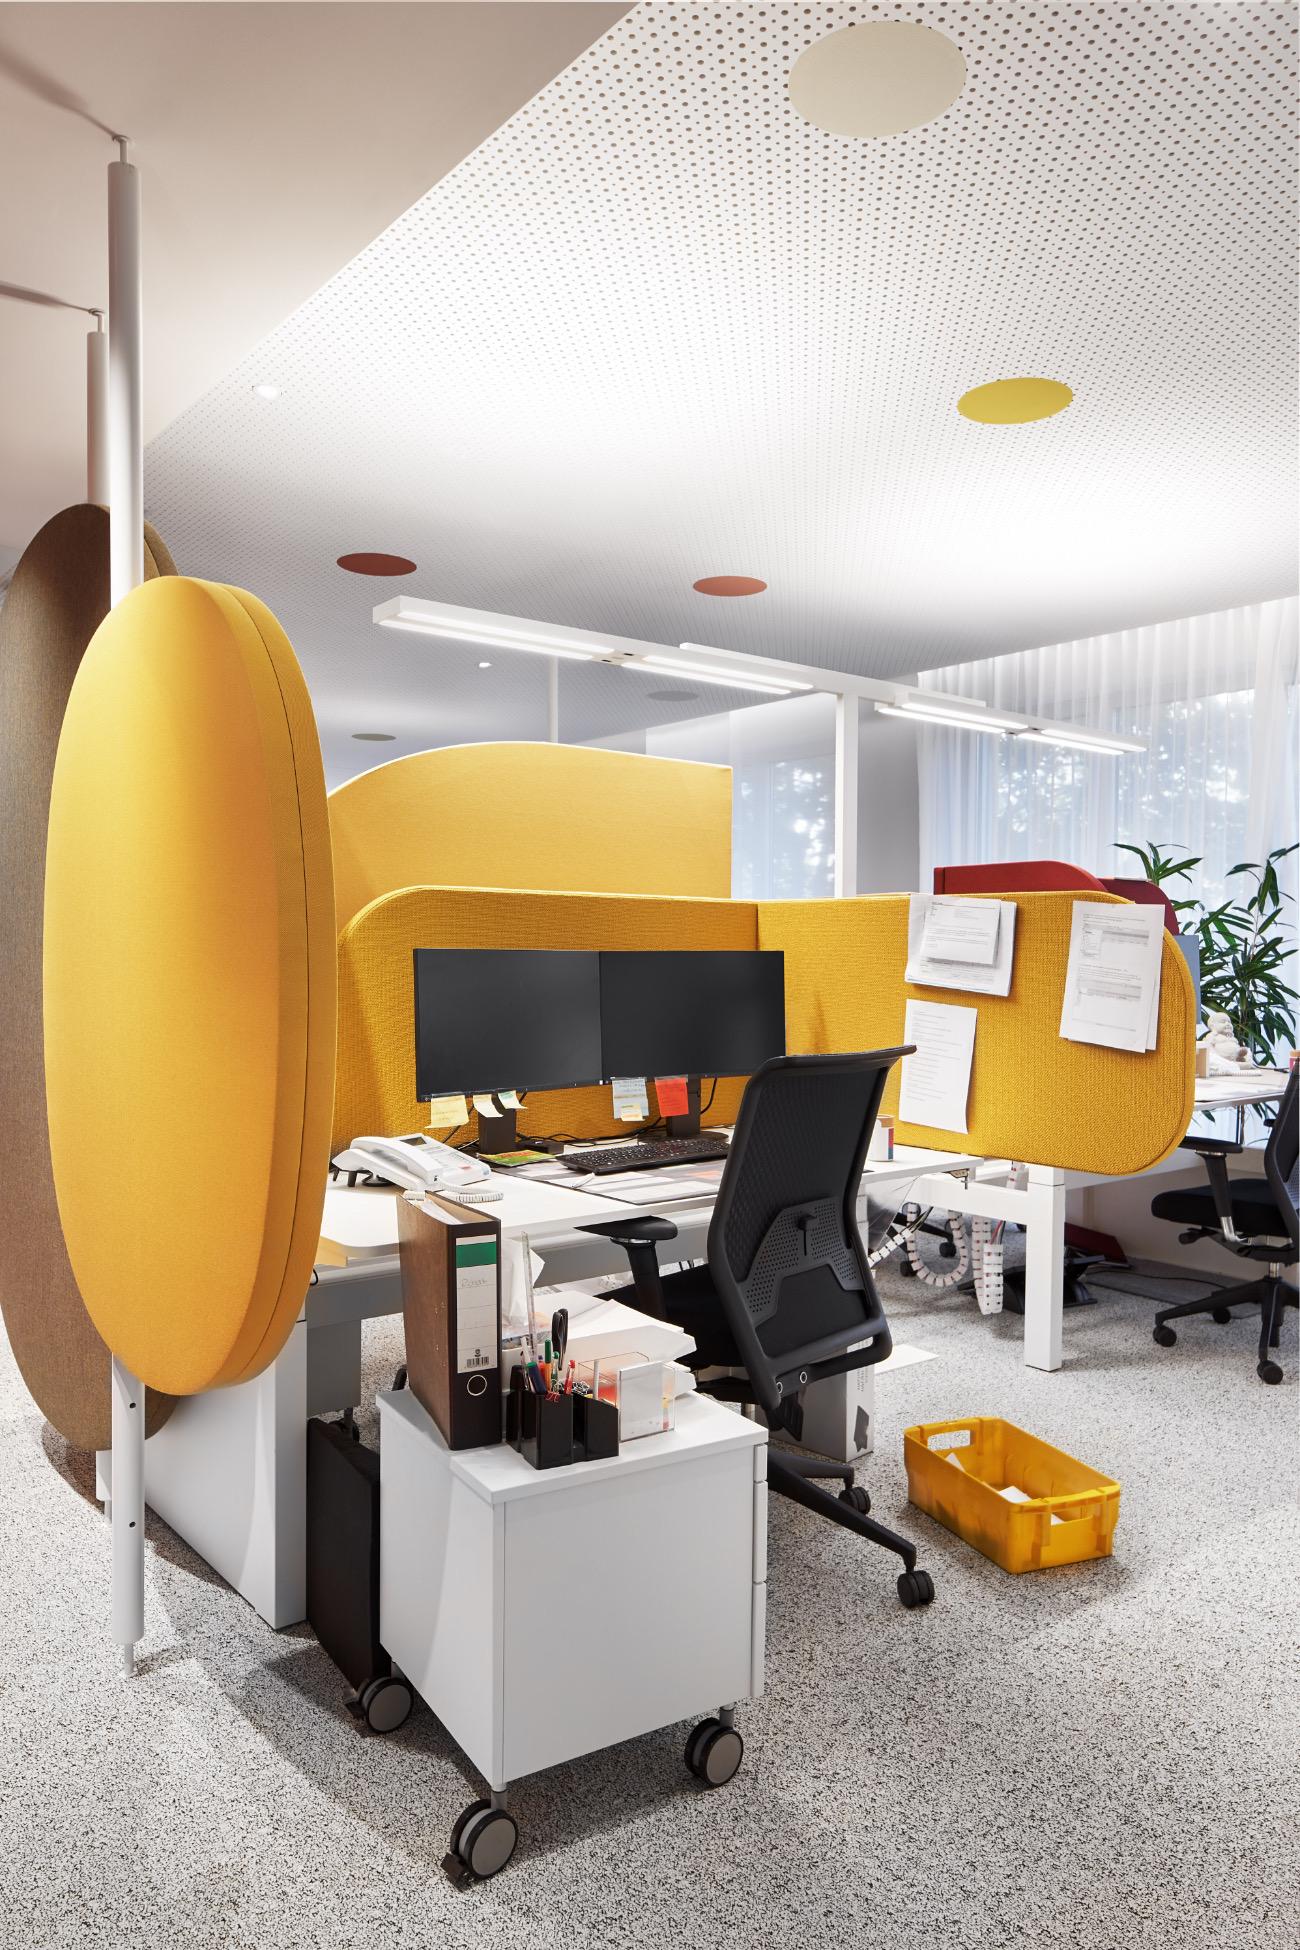 aktion-mensch-office-13